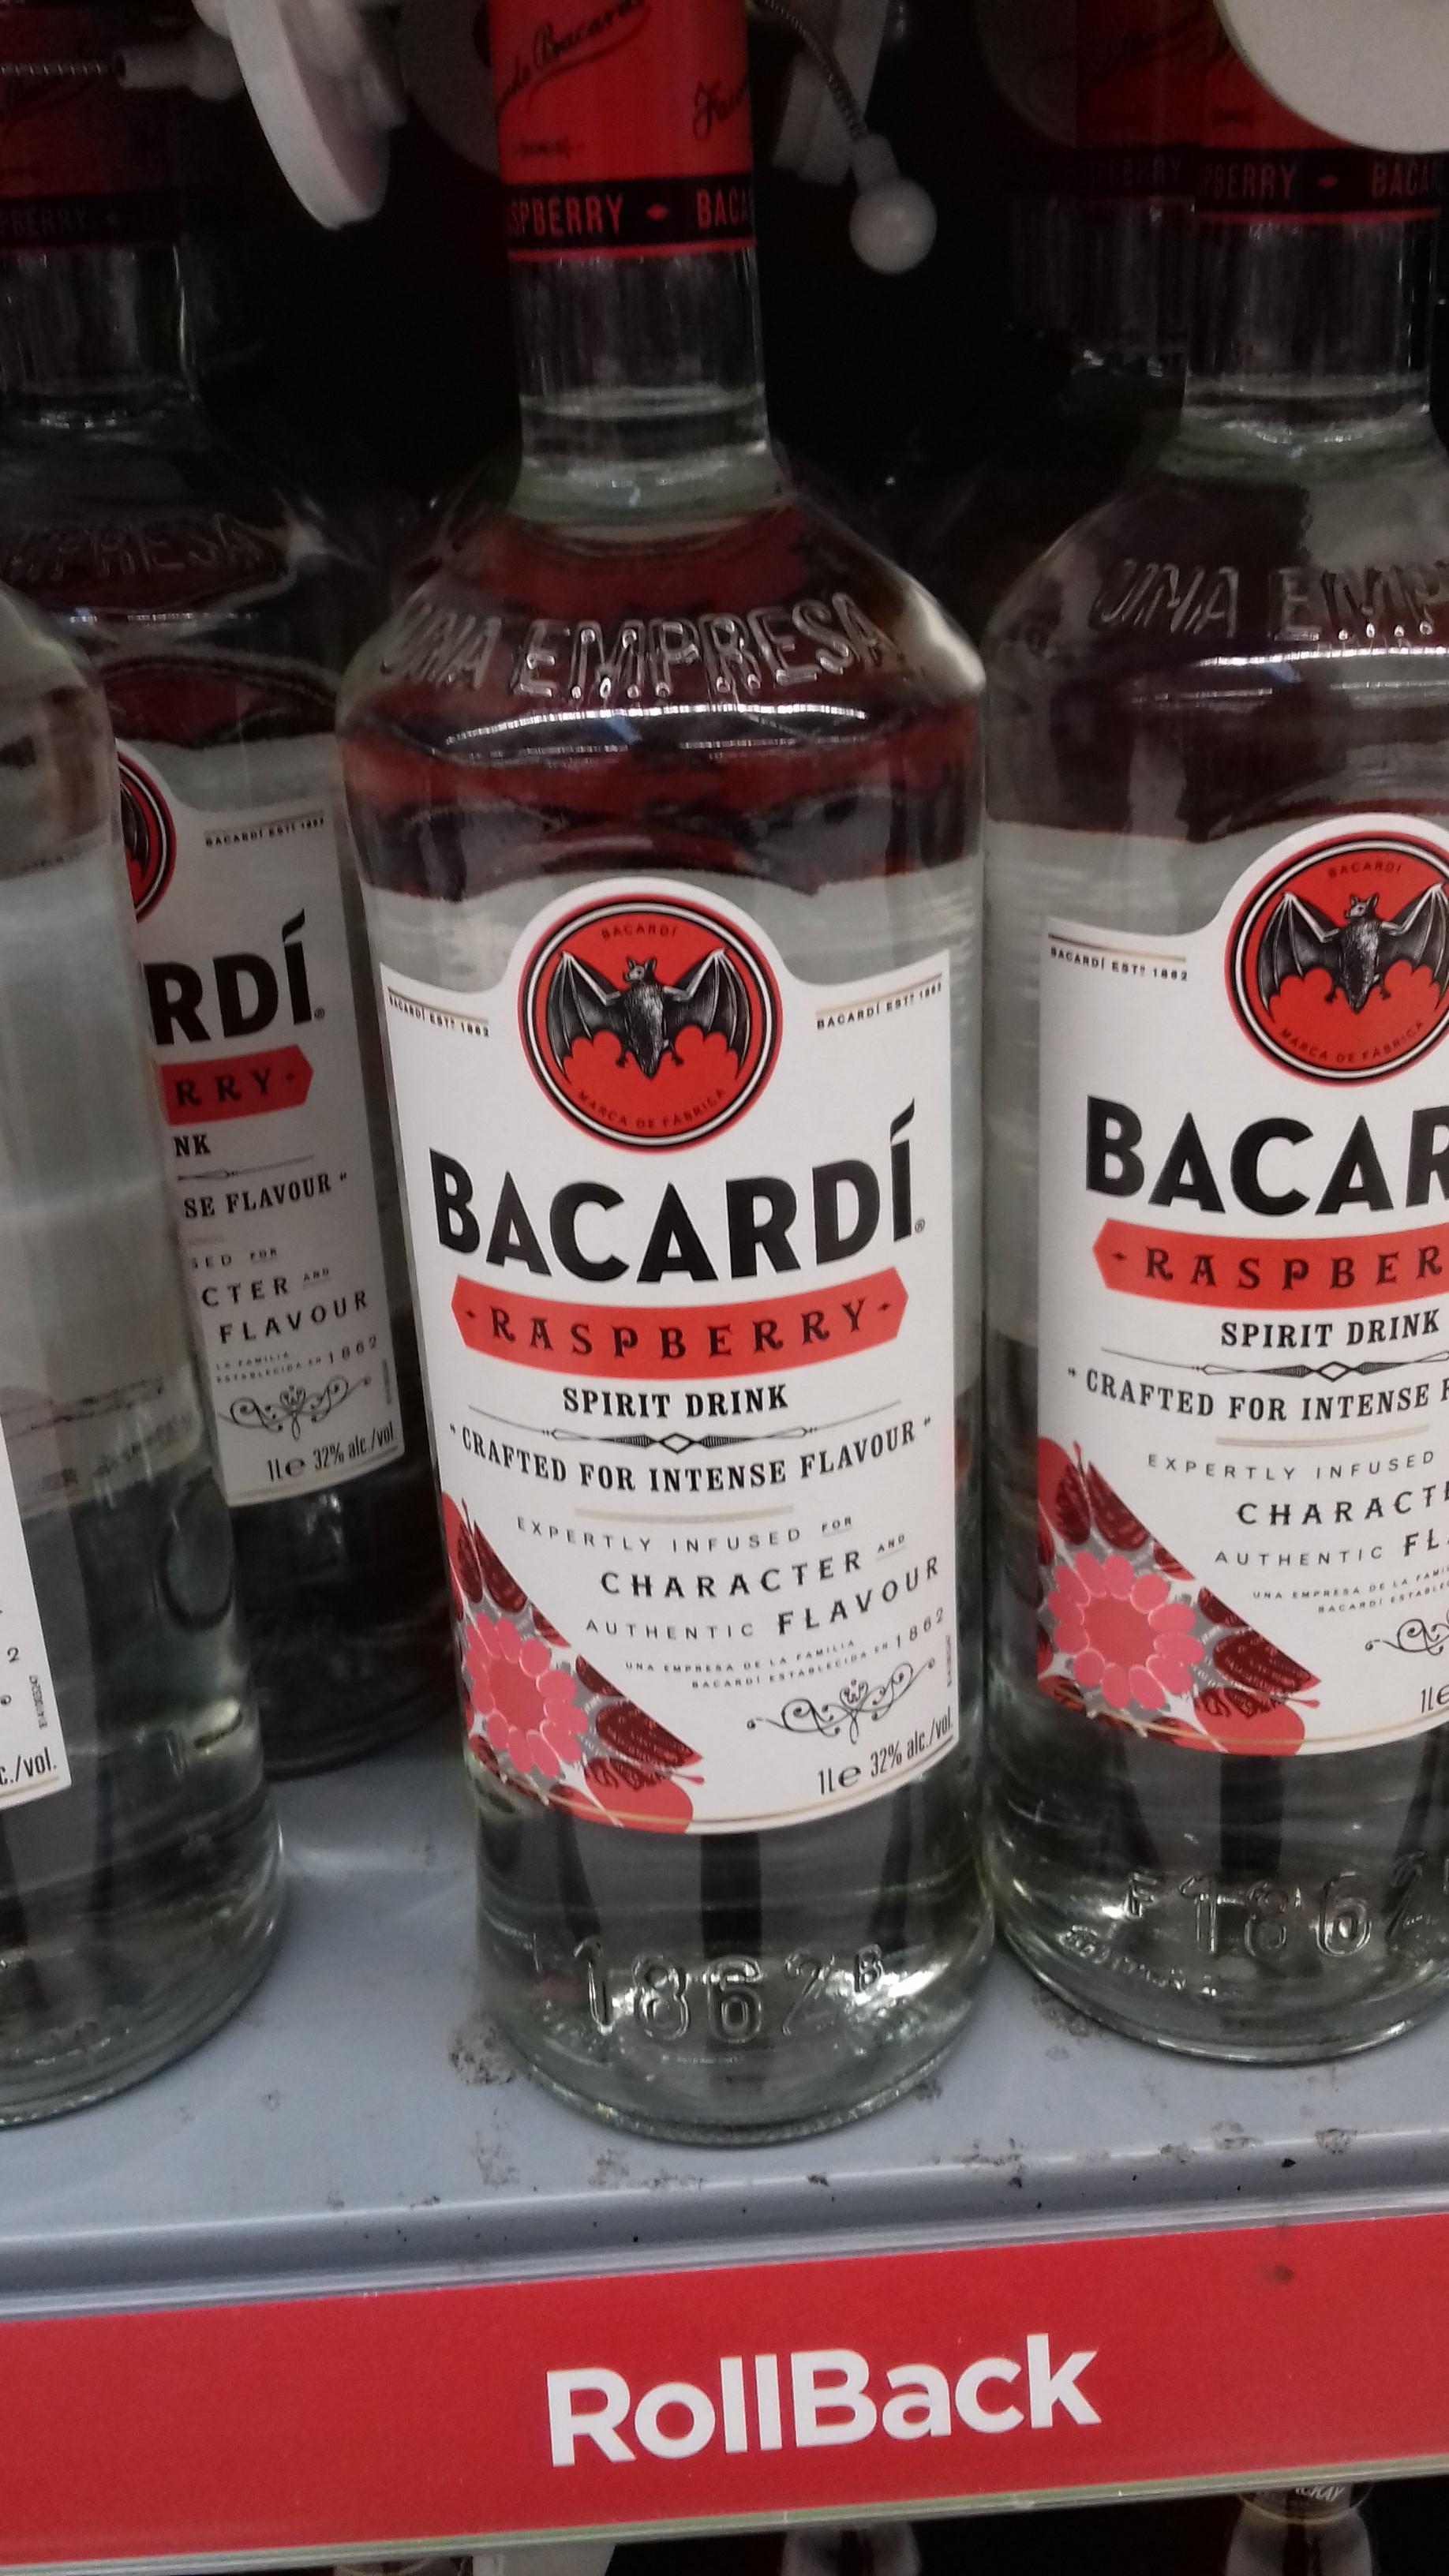 Bacardi Raspberry £16 a litre at Asda